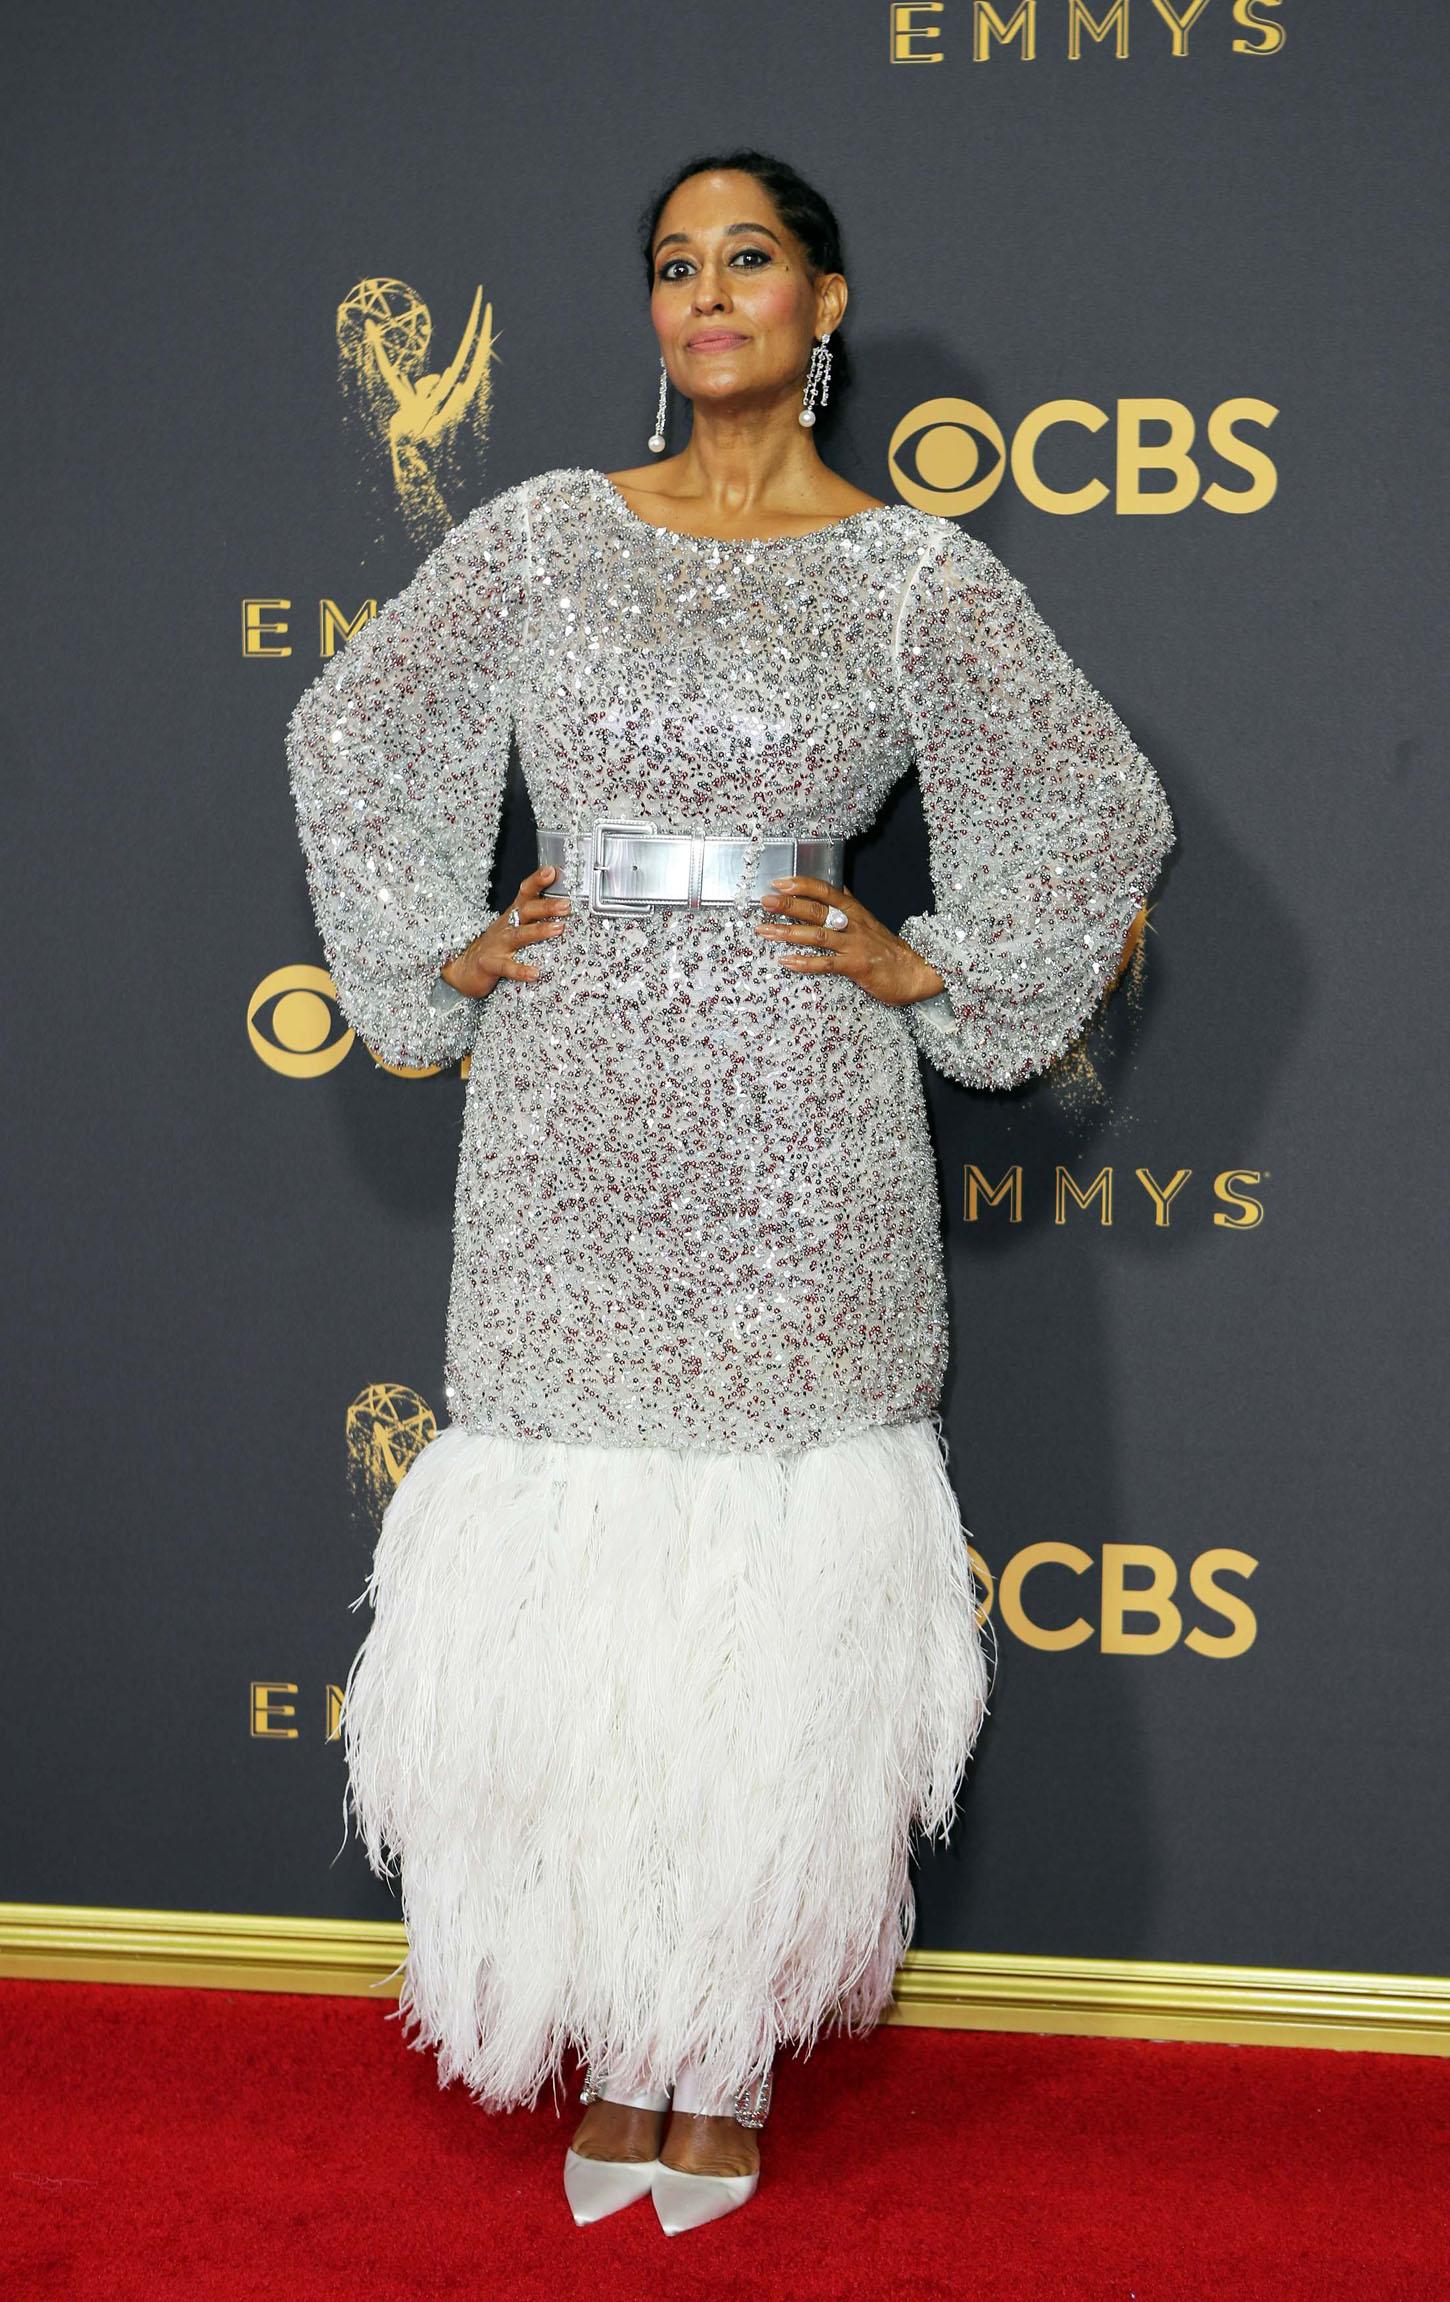 69th Primetime Emmy Awards Äì Arrivals Äì Los Angeles, California, U.S., 17/09/2017 - Tracee Ellis Ross. REUTERS/Mike Blake